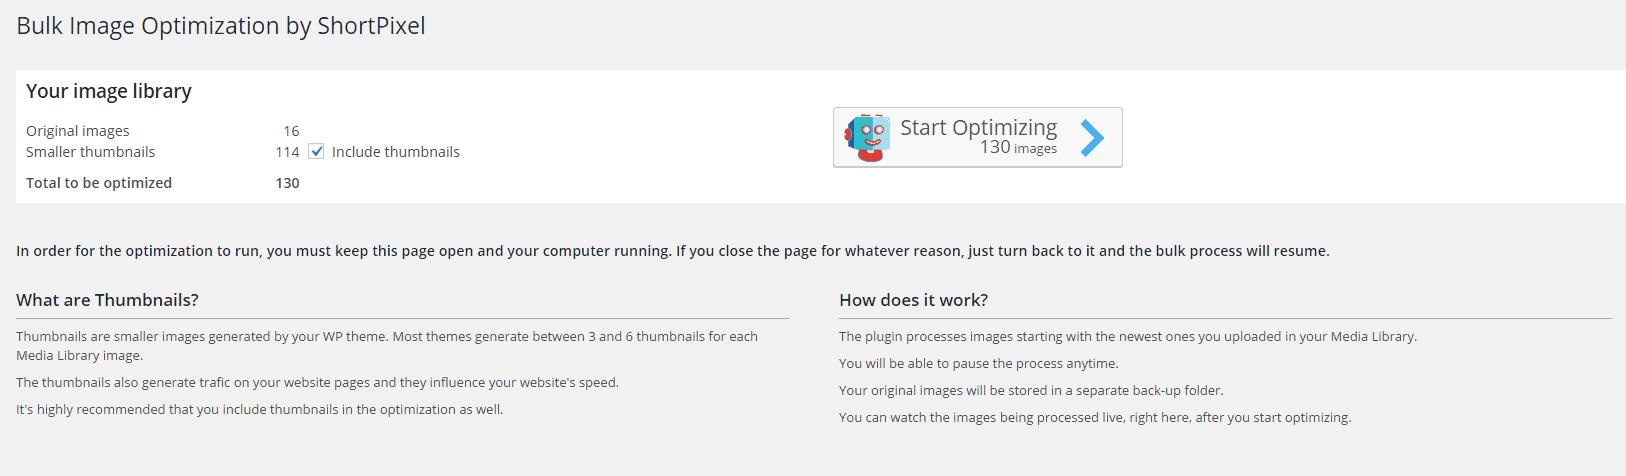 Bulk-Image-Optimization-ShortPixel